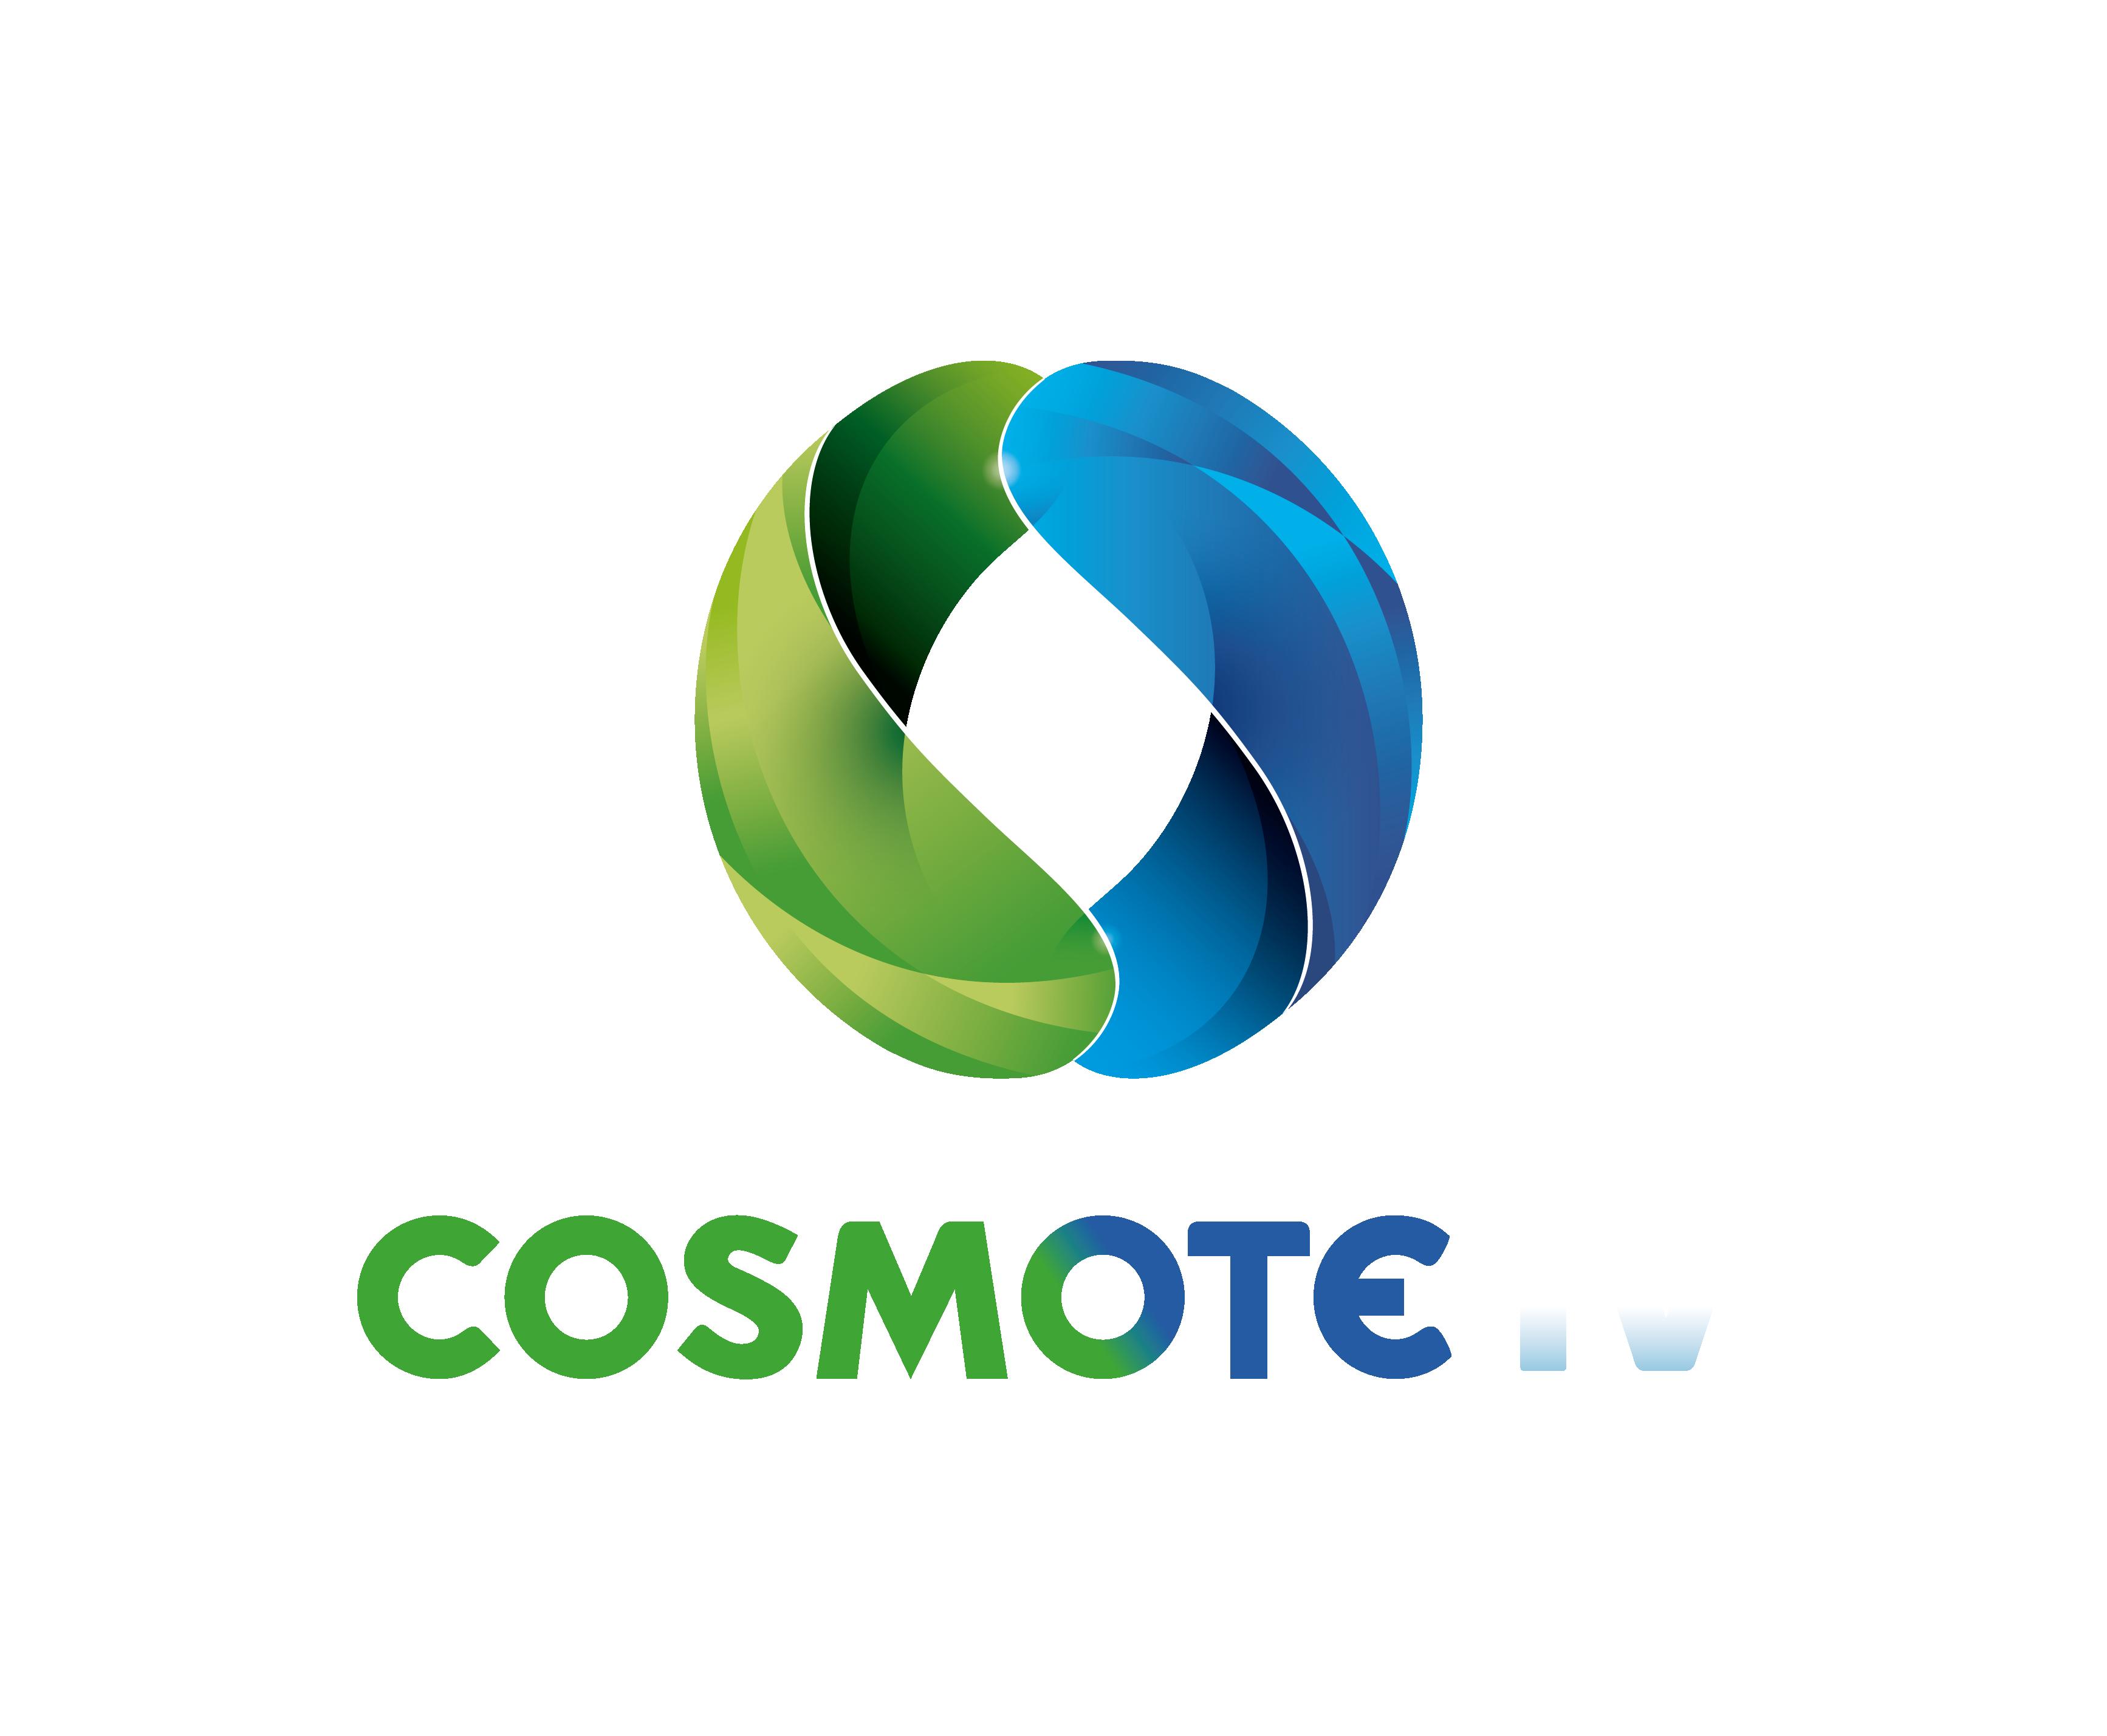 To τζάμπολ για τη νέα σεζόν της ACB Liga Endesa δίνεται αποκλειστικά στην COSMOTE TV